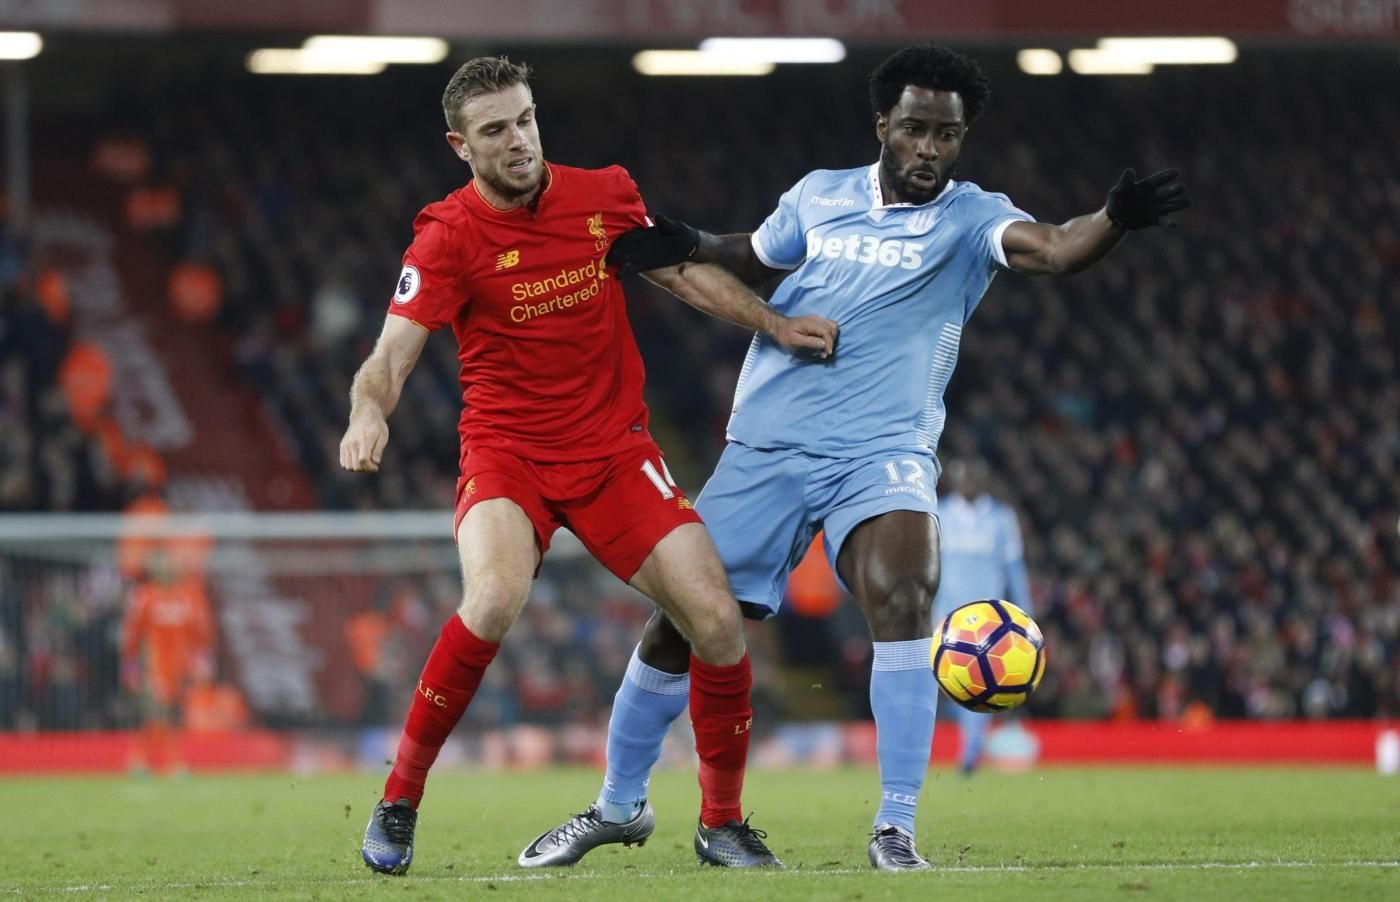 Premier League:Liverpool v Stoke City